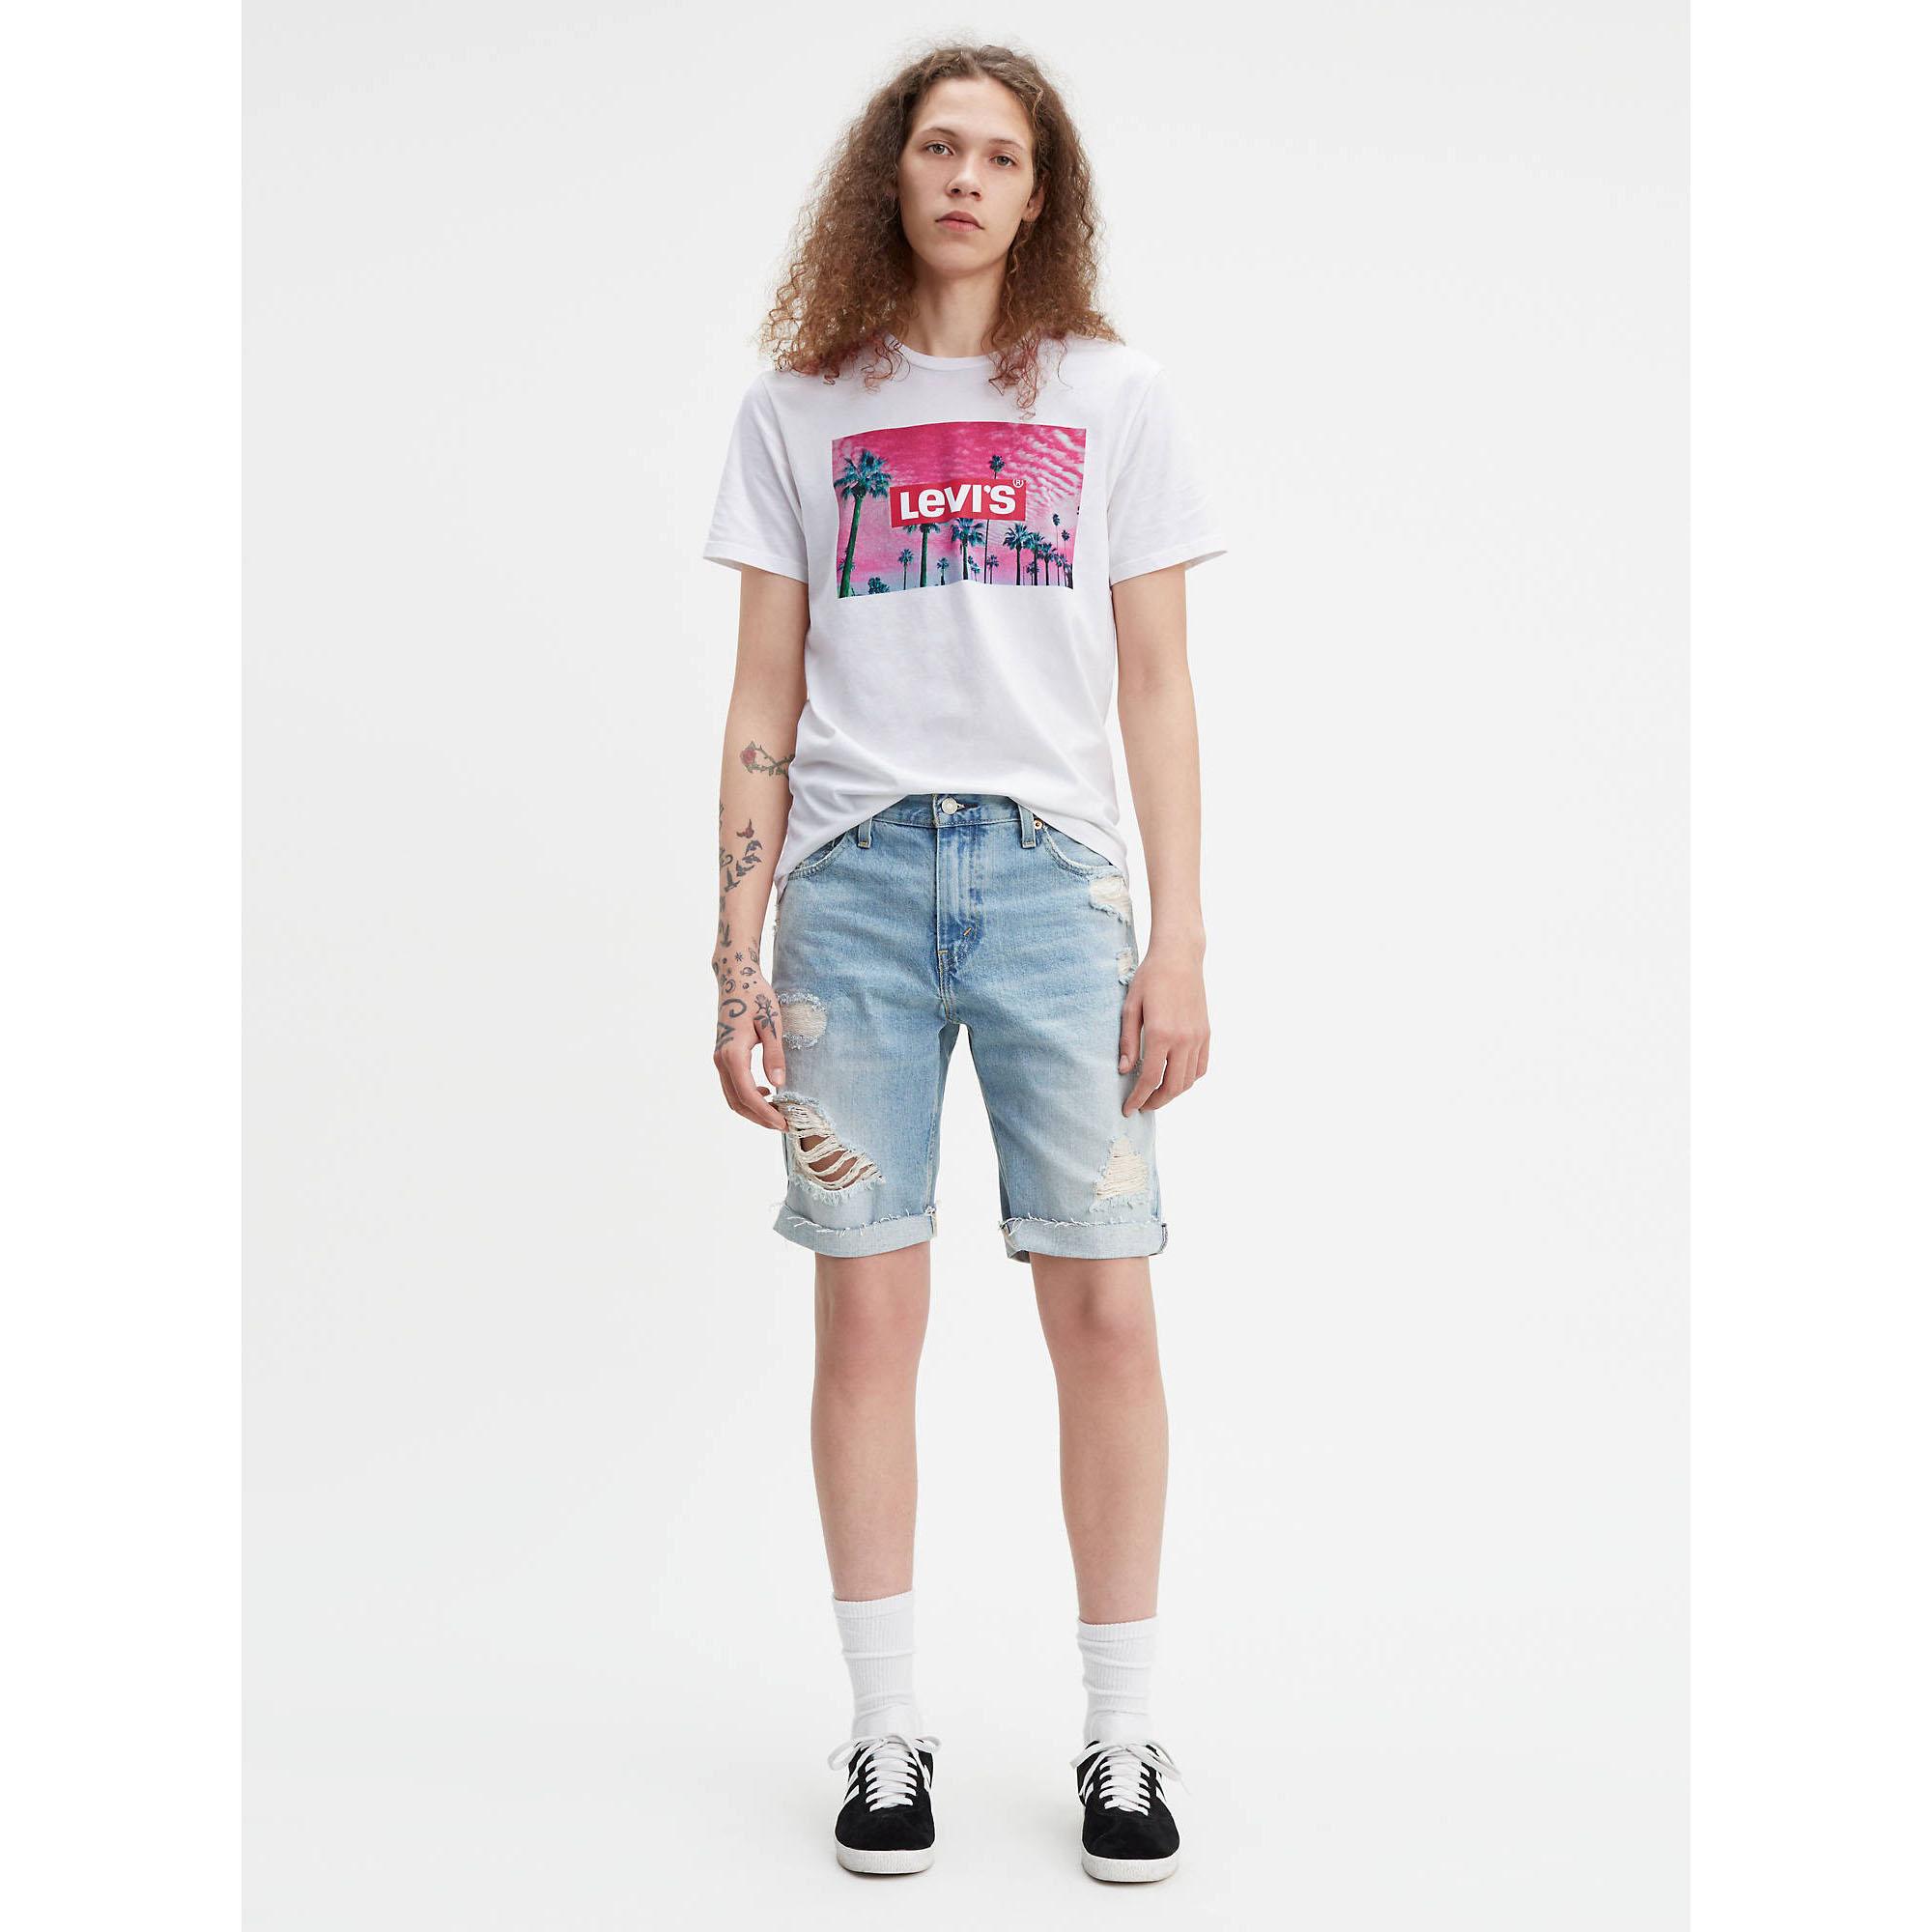 Levi's 511 Slim Cut-Off 10 In. Shorts